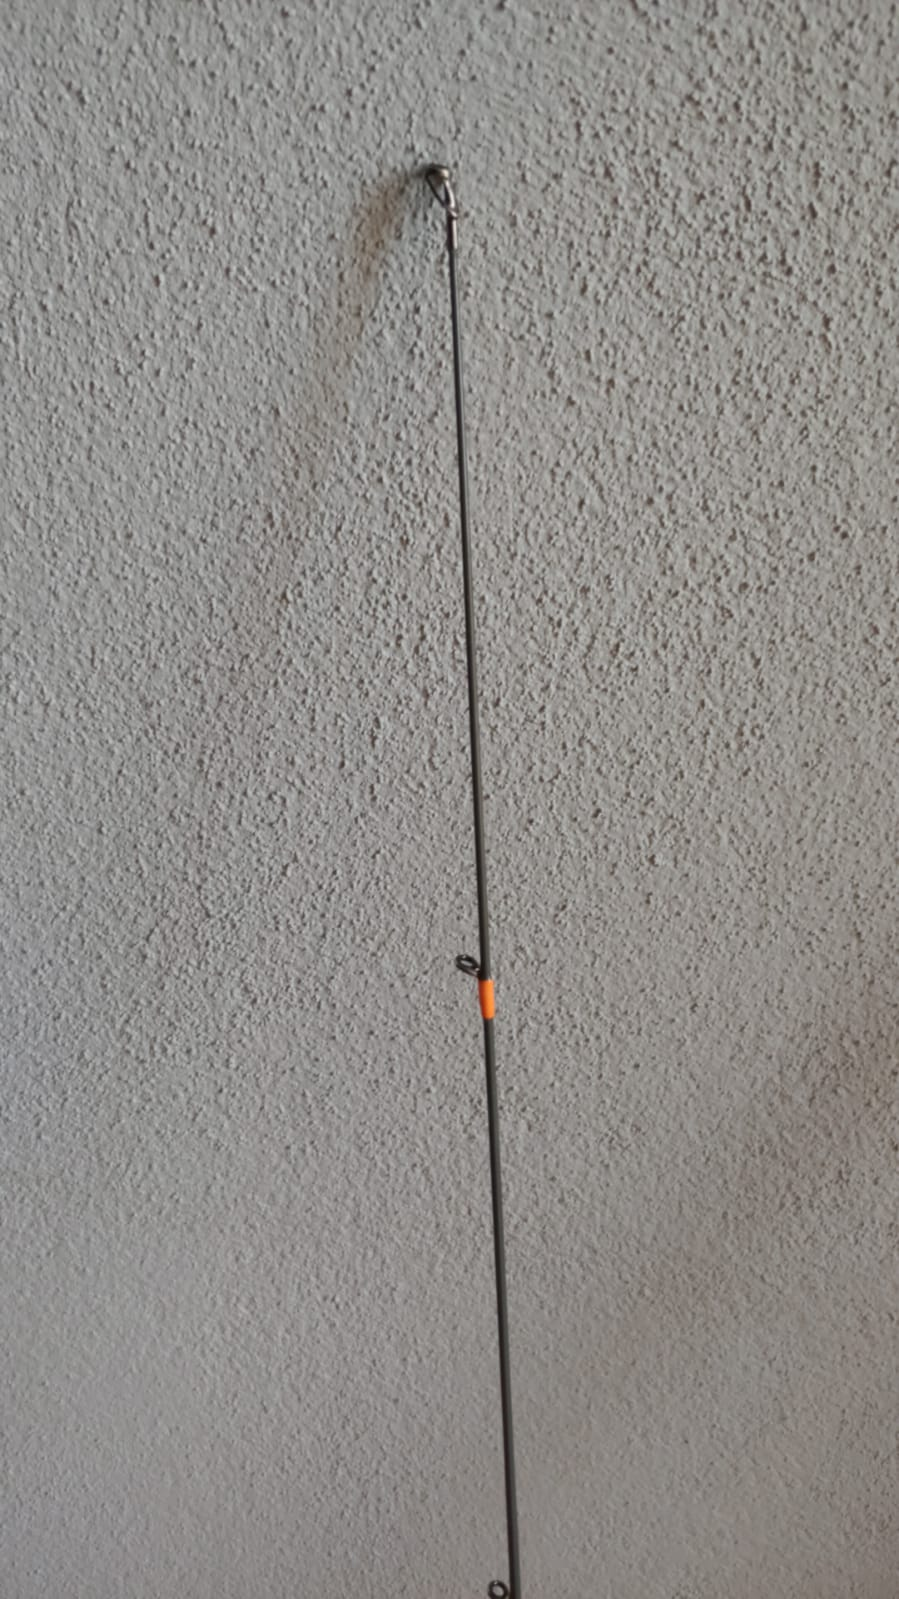 [VENDO][USATO] Taiwalk salty shape da eging L-EGING 83UL/SL accorciata  Whatsa15